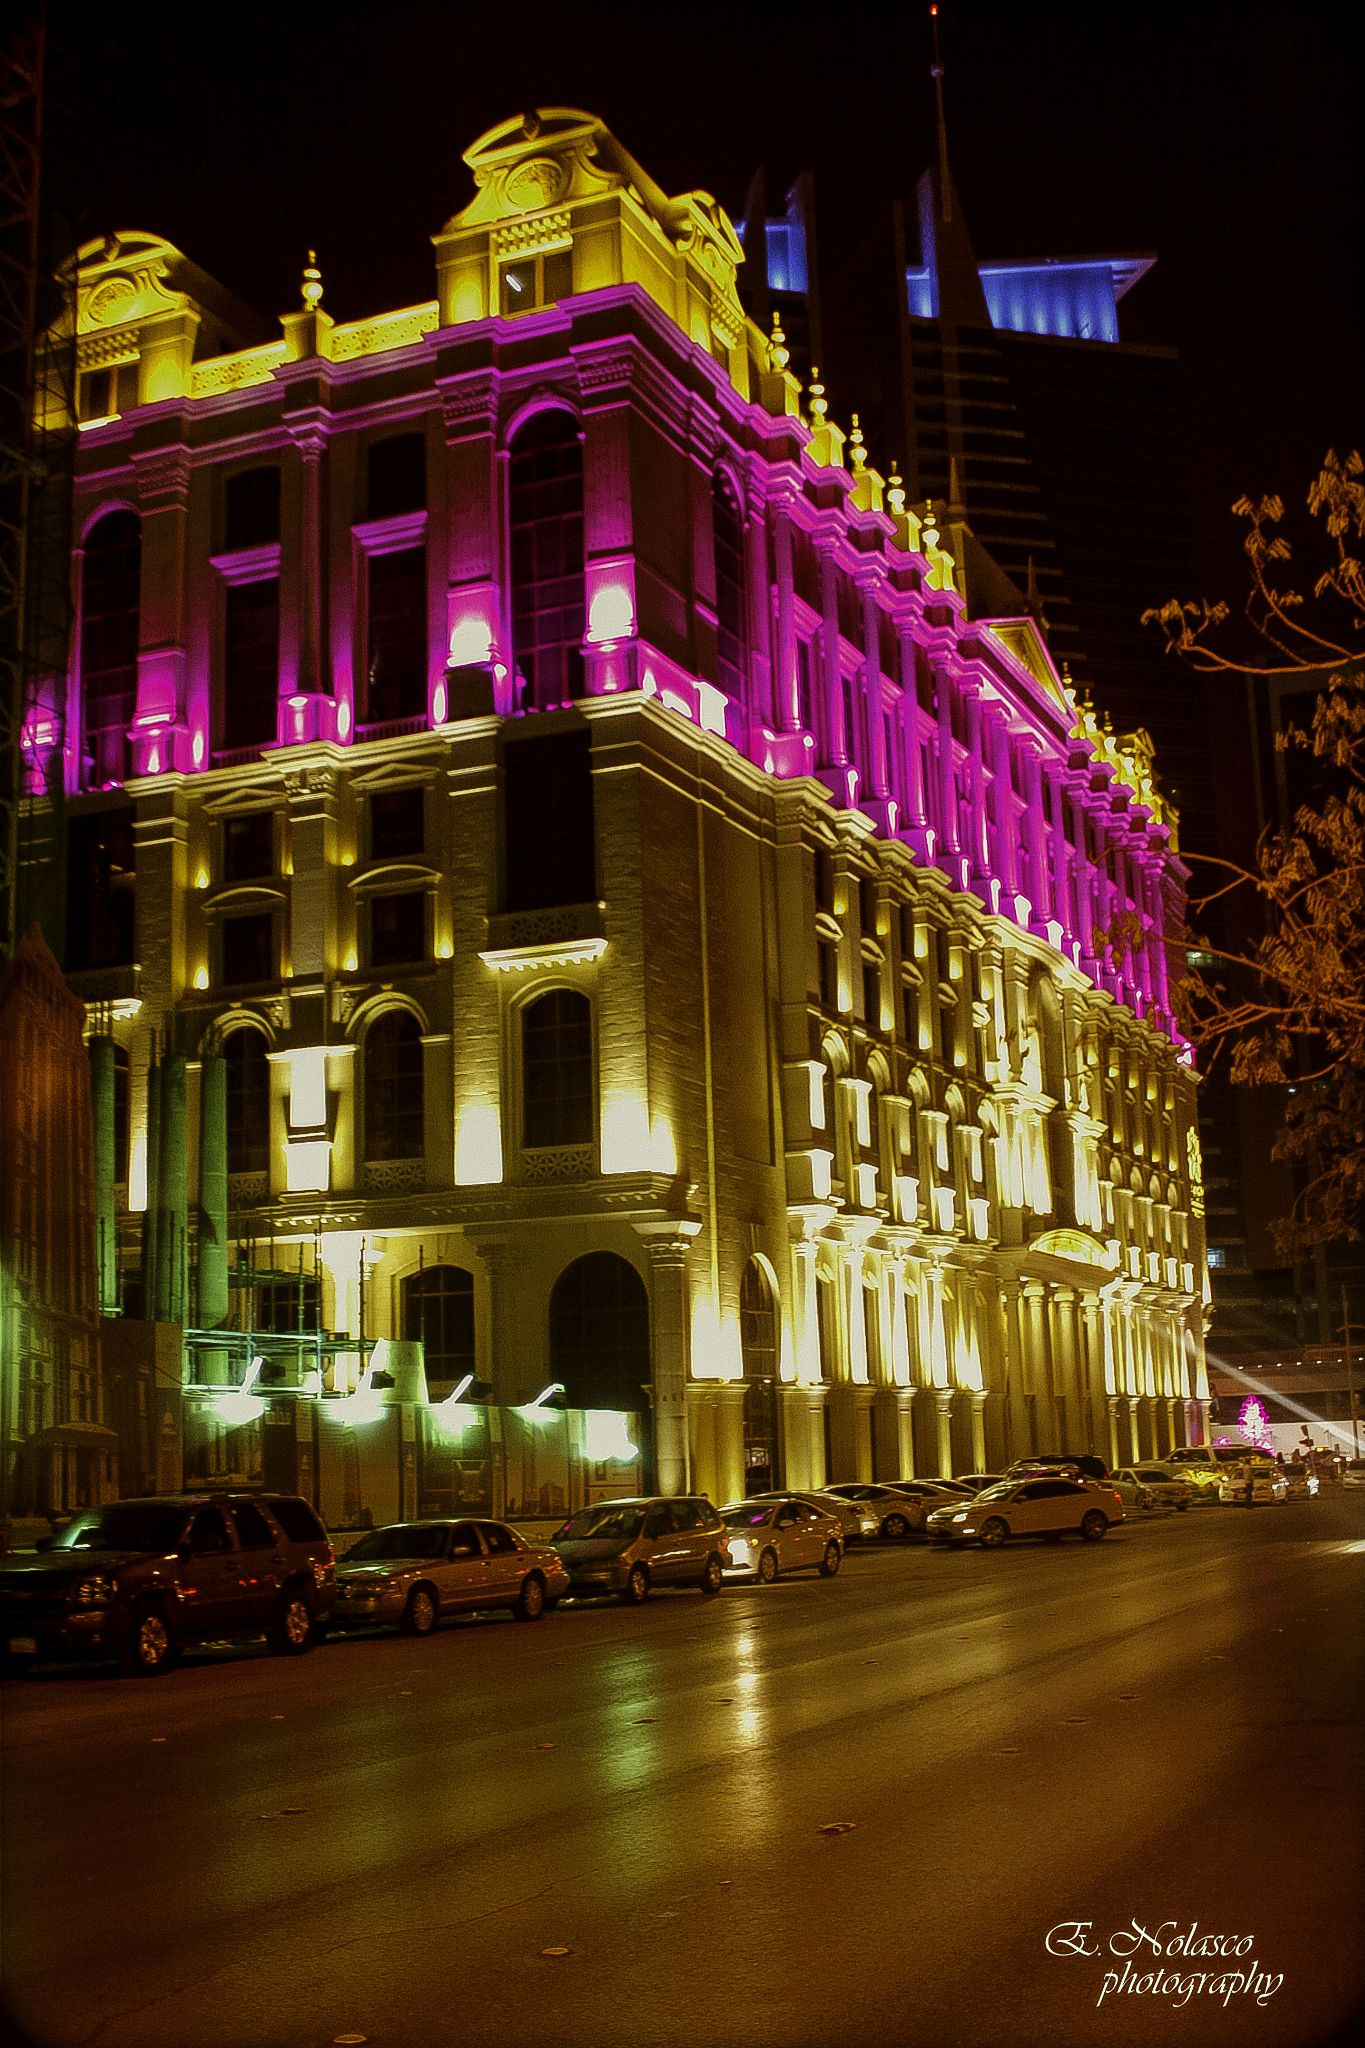 AT THE HOTEL by Elichander Nolasco